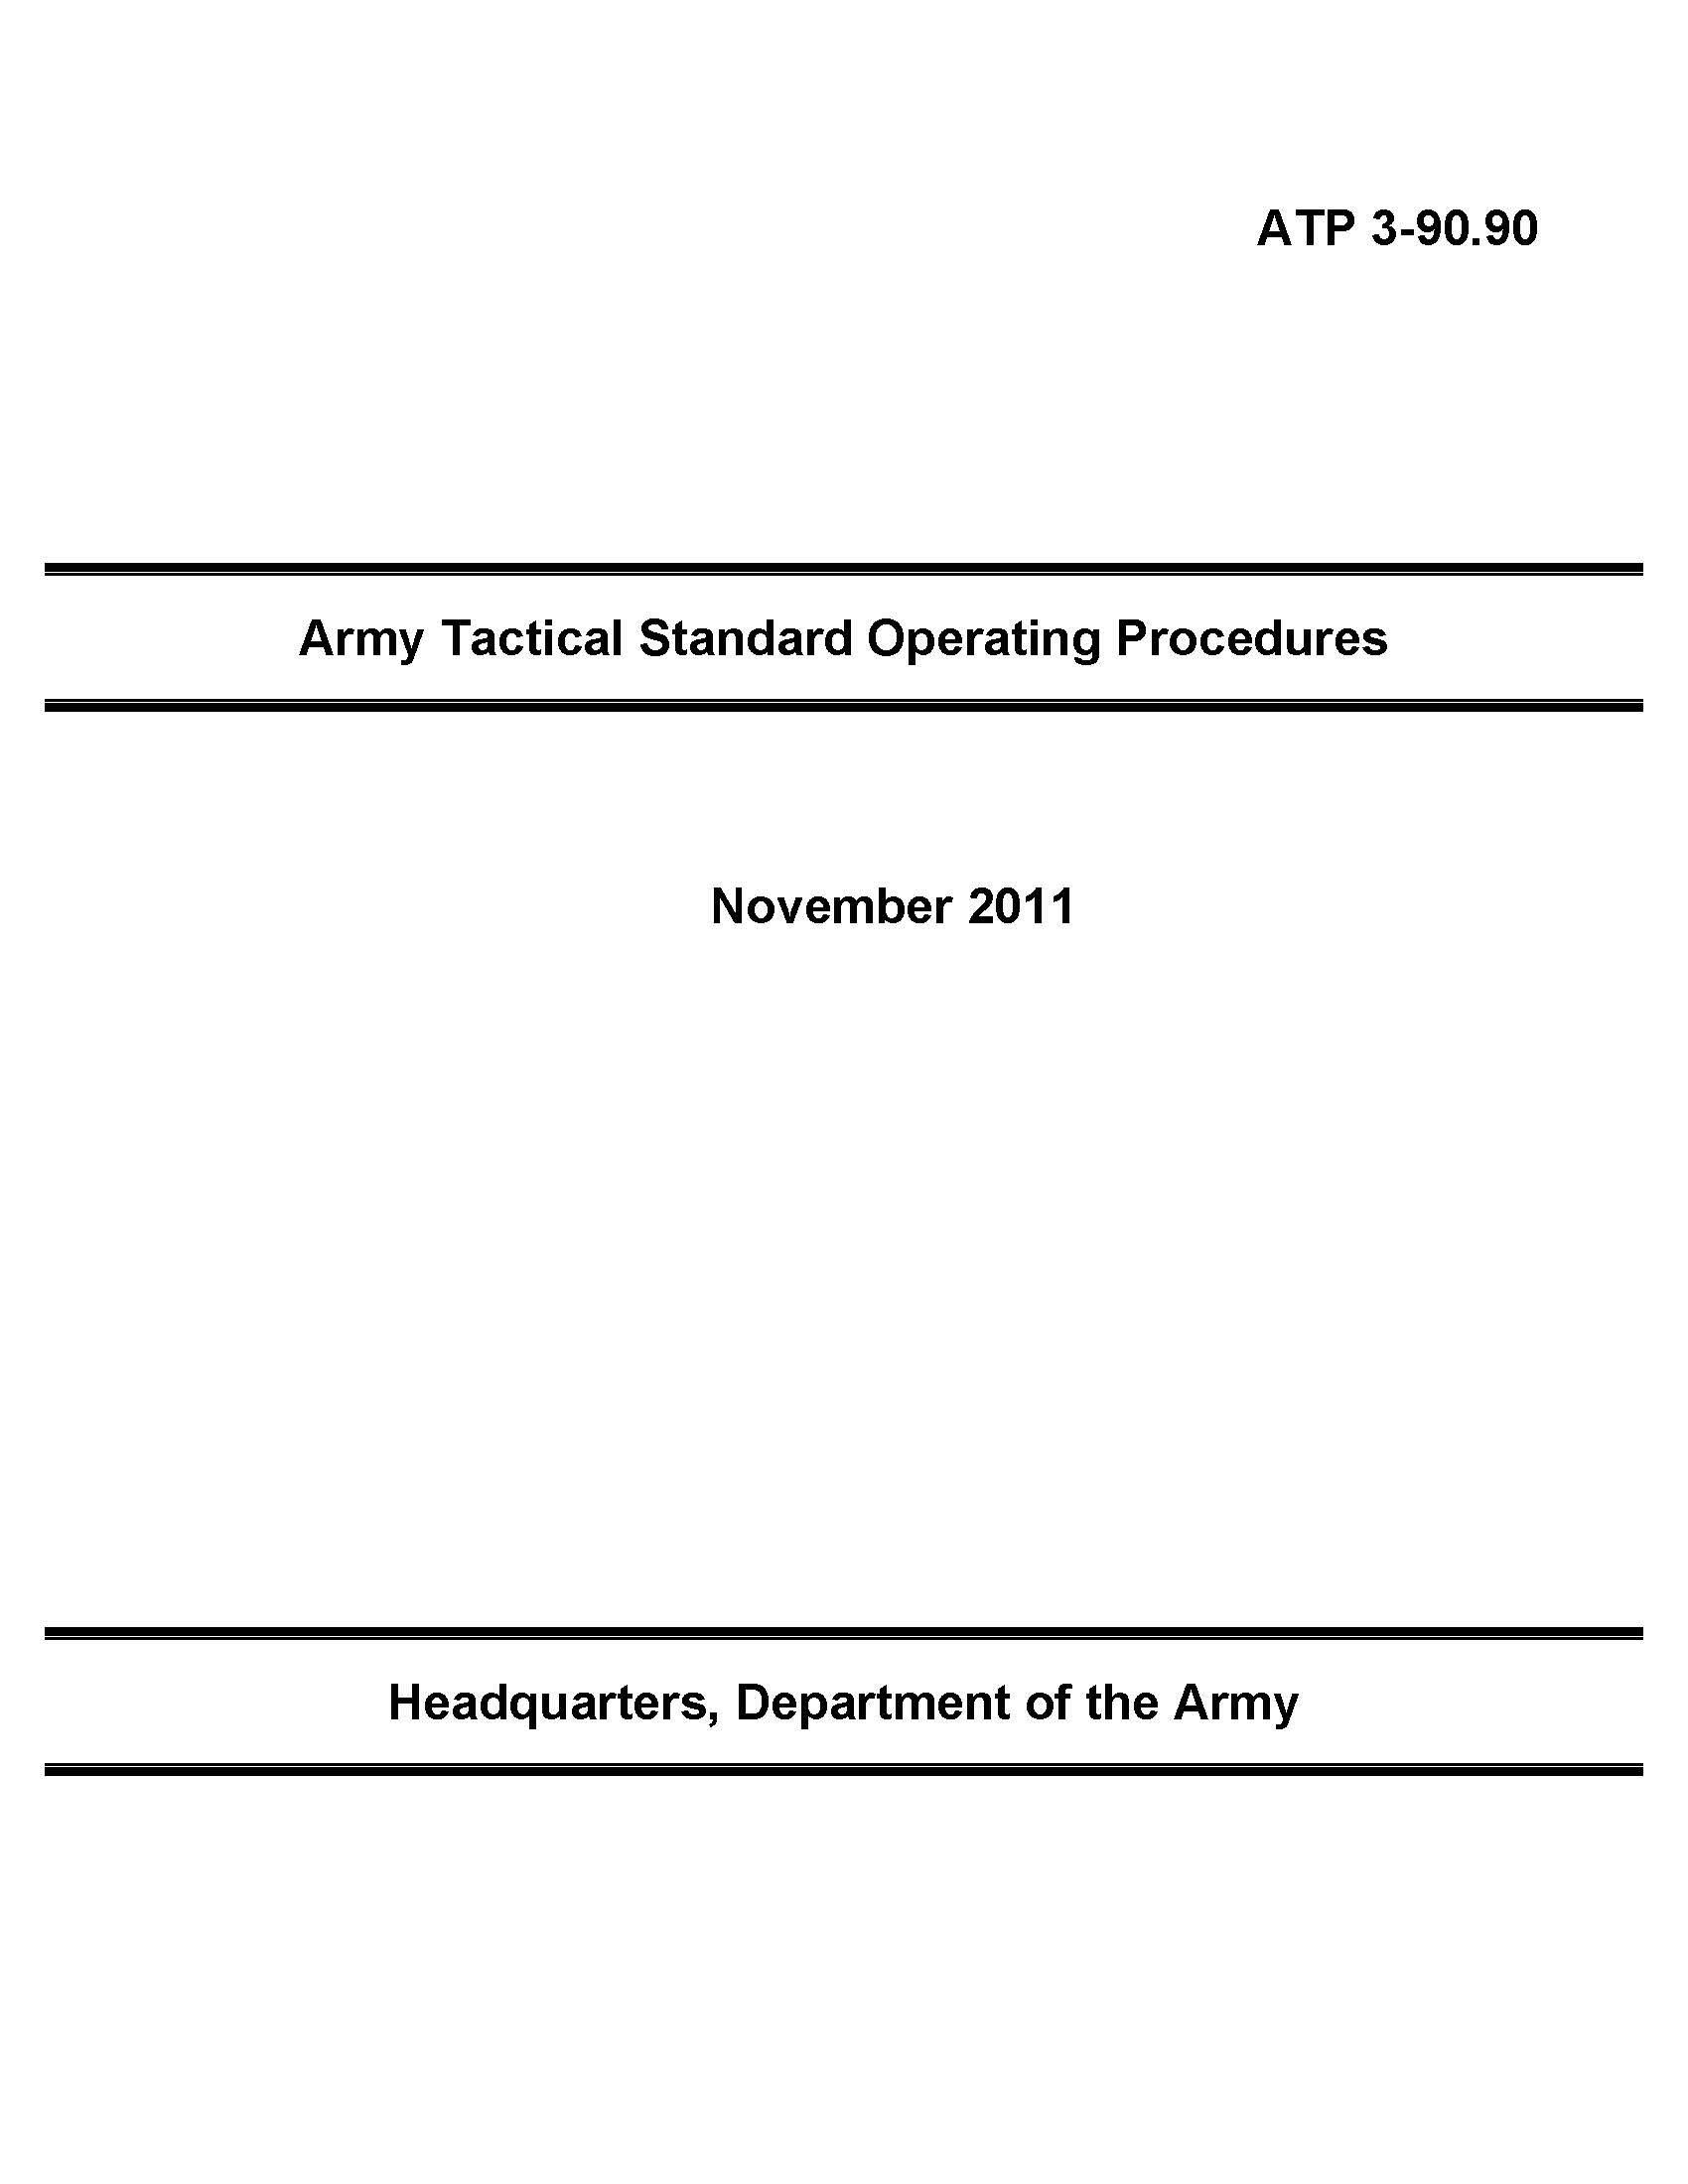 Download Army Tactical Standard Operating Procedures, ATP 3-90.90, November 2011 ebook